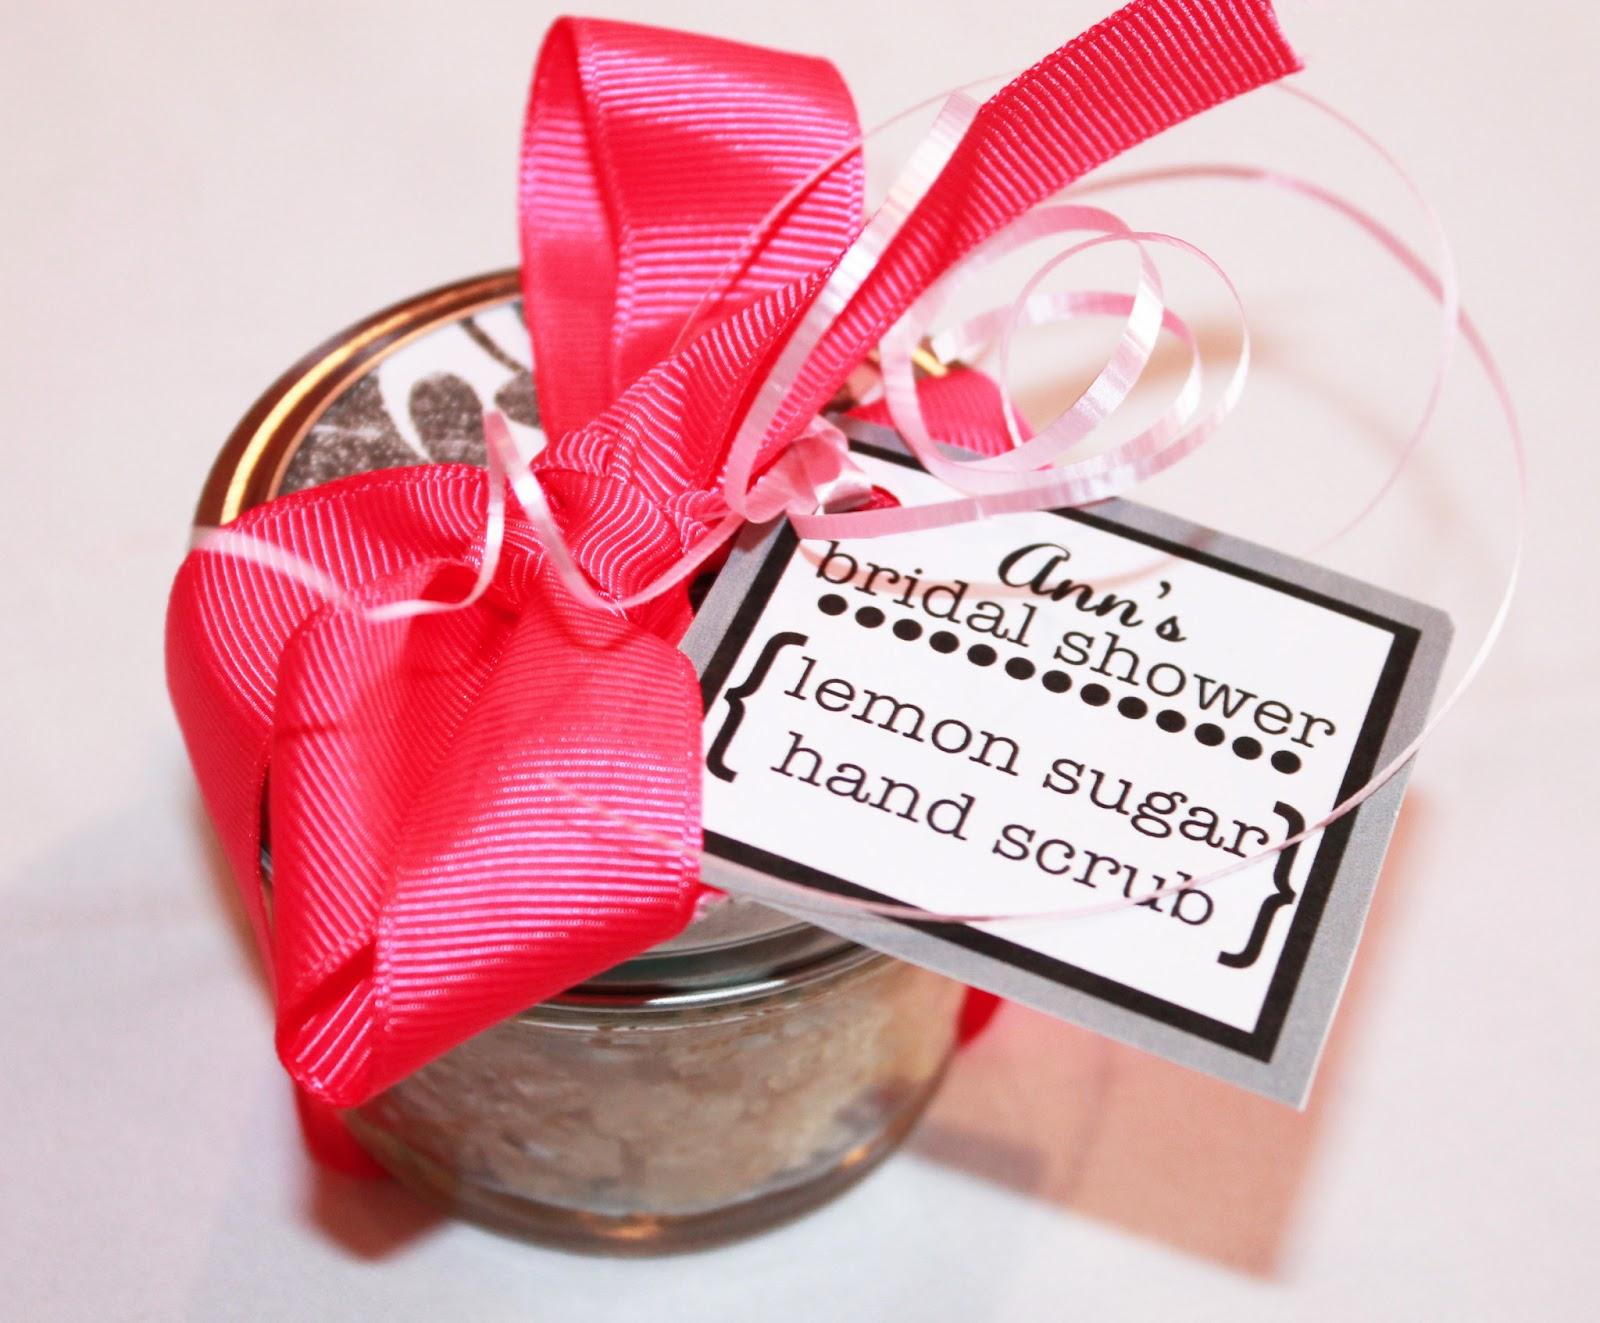 girlsgonefood: DIY Bridal Shower Decorations